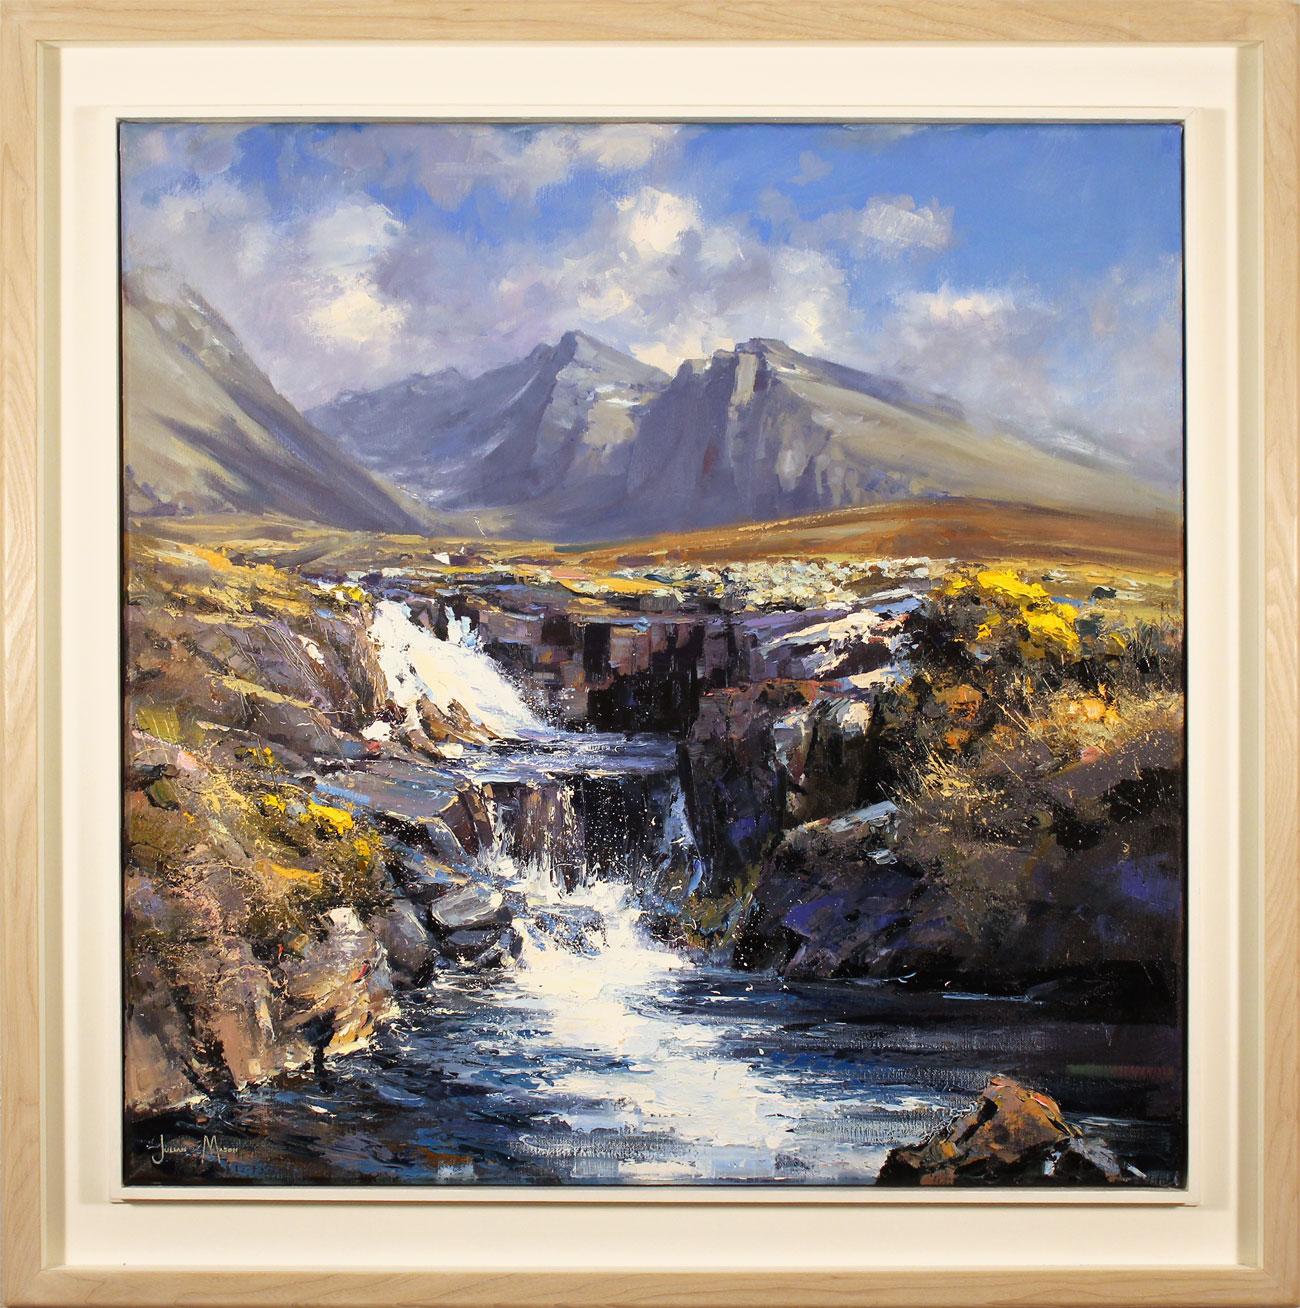 Julian Mason, Original oil painting on canvas, Allt Coire Lagan, Skye. Click to enlarge